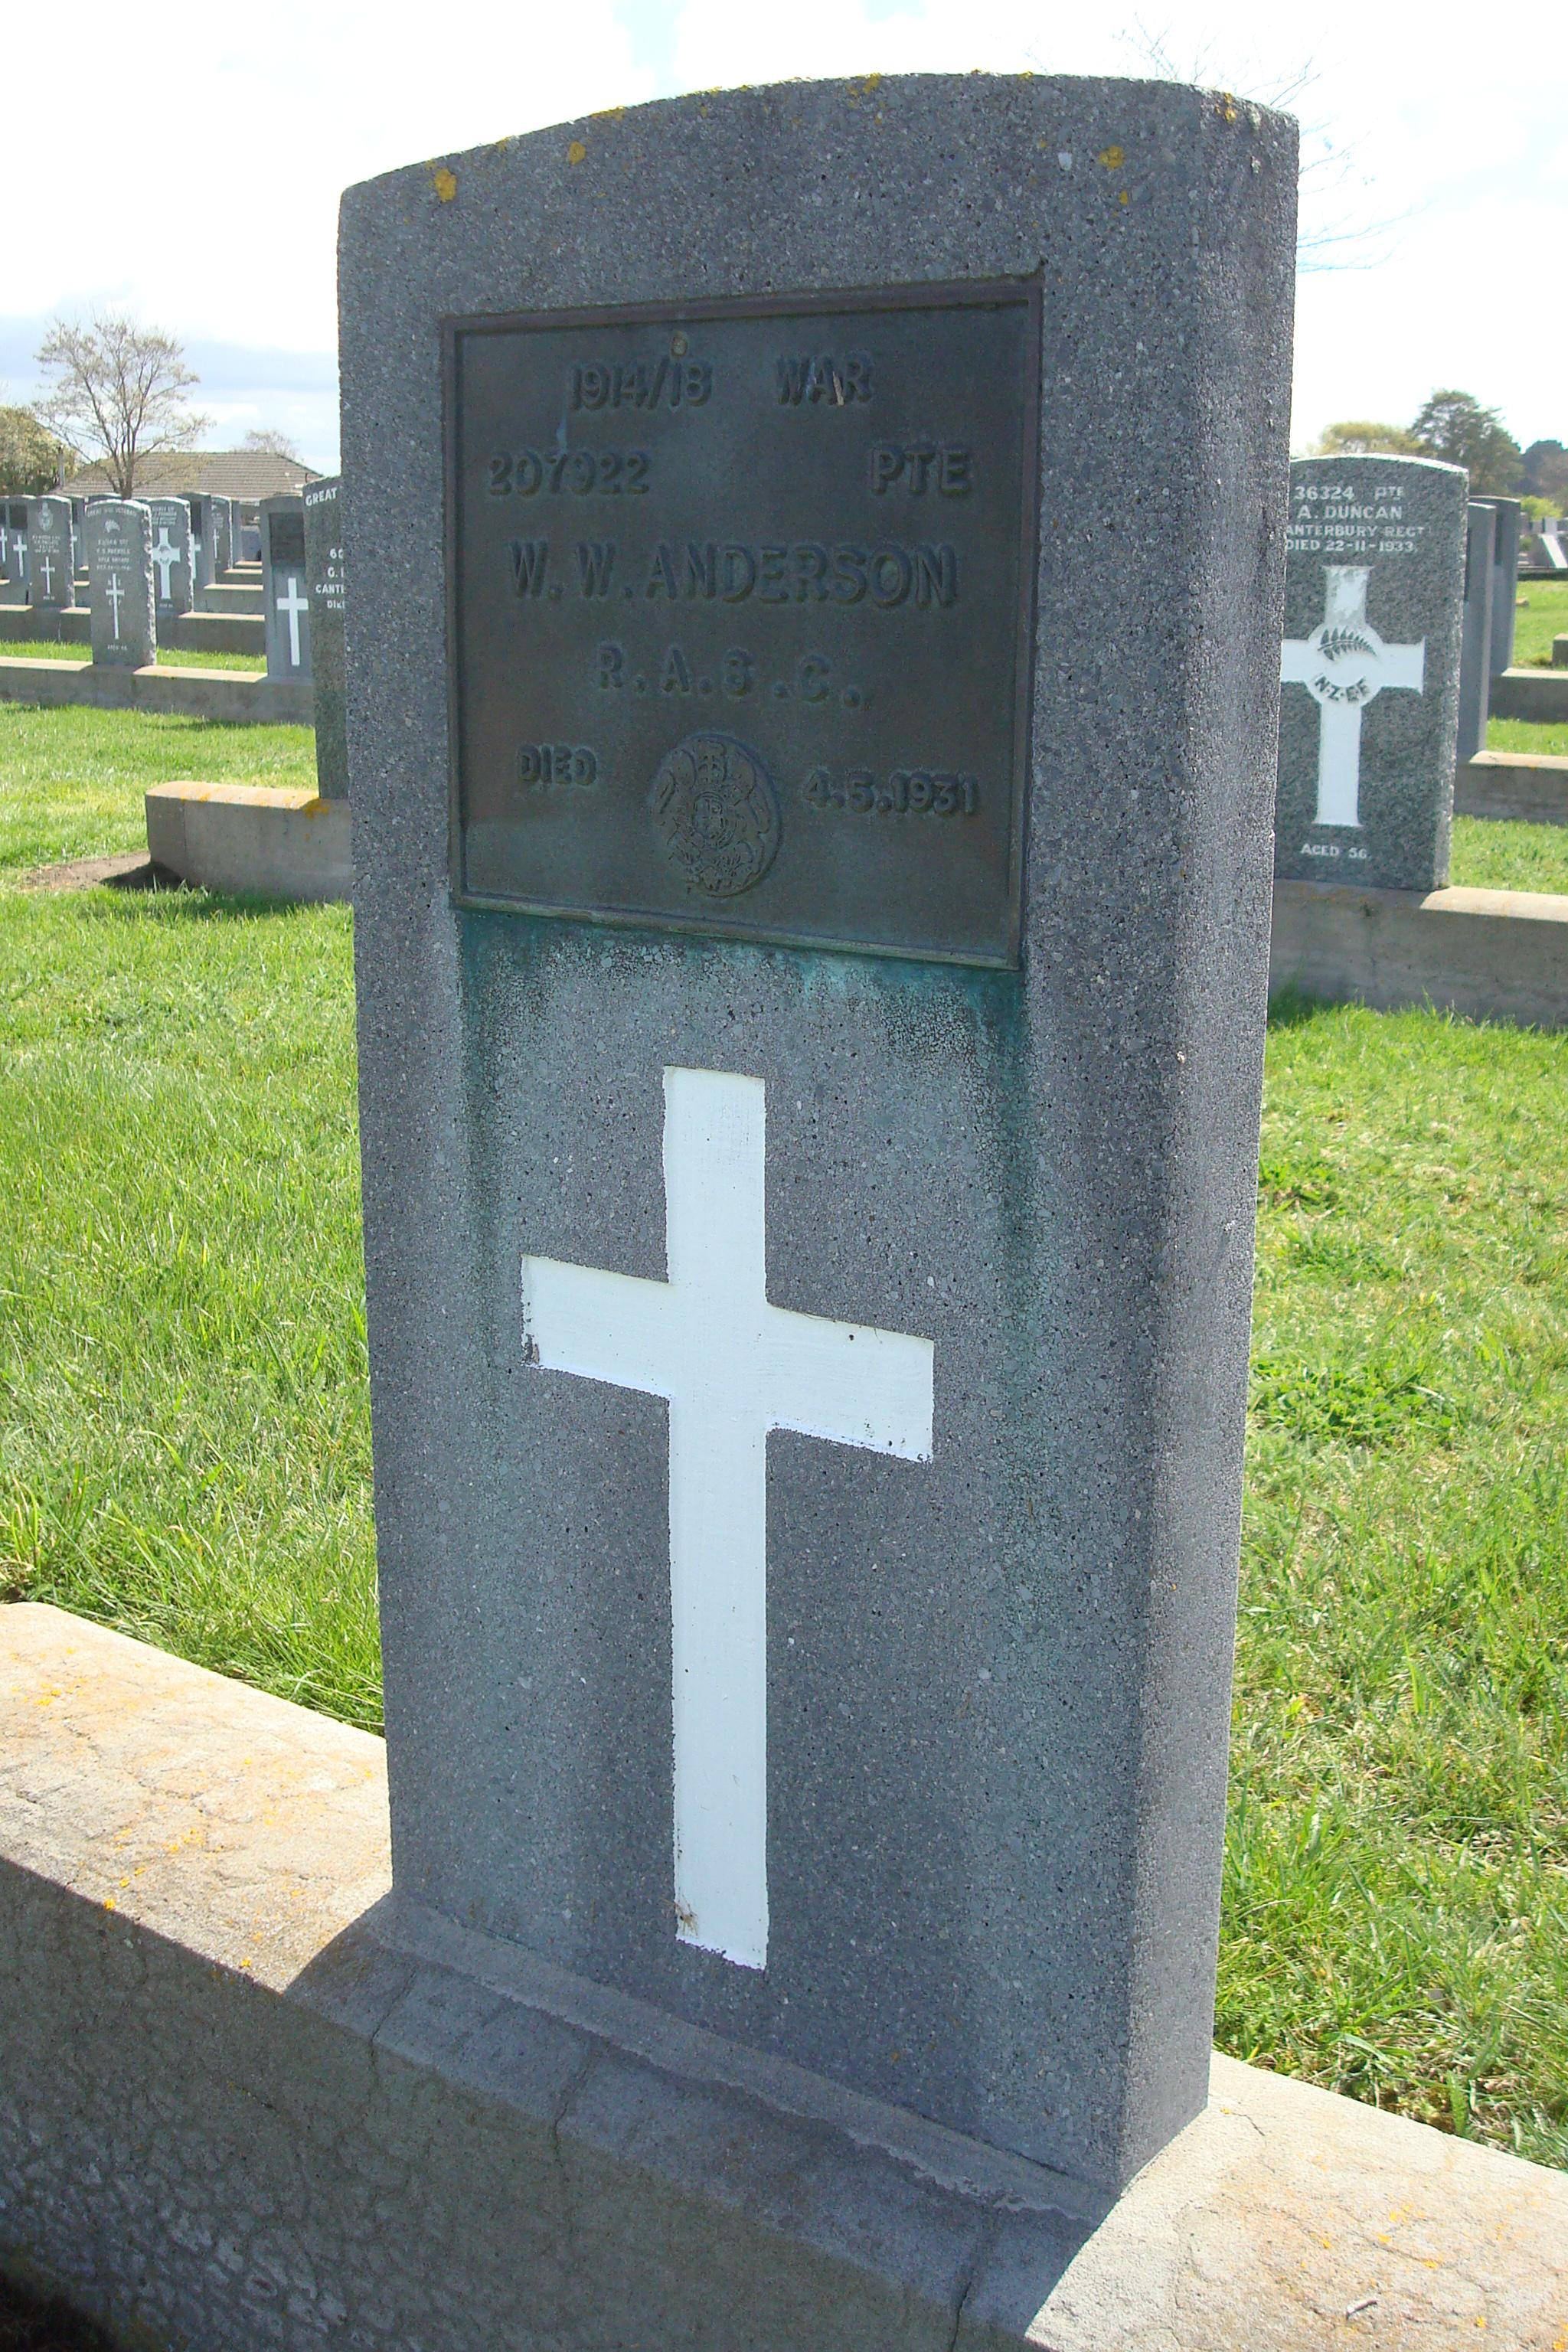 Grave of William Walter Anderson